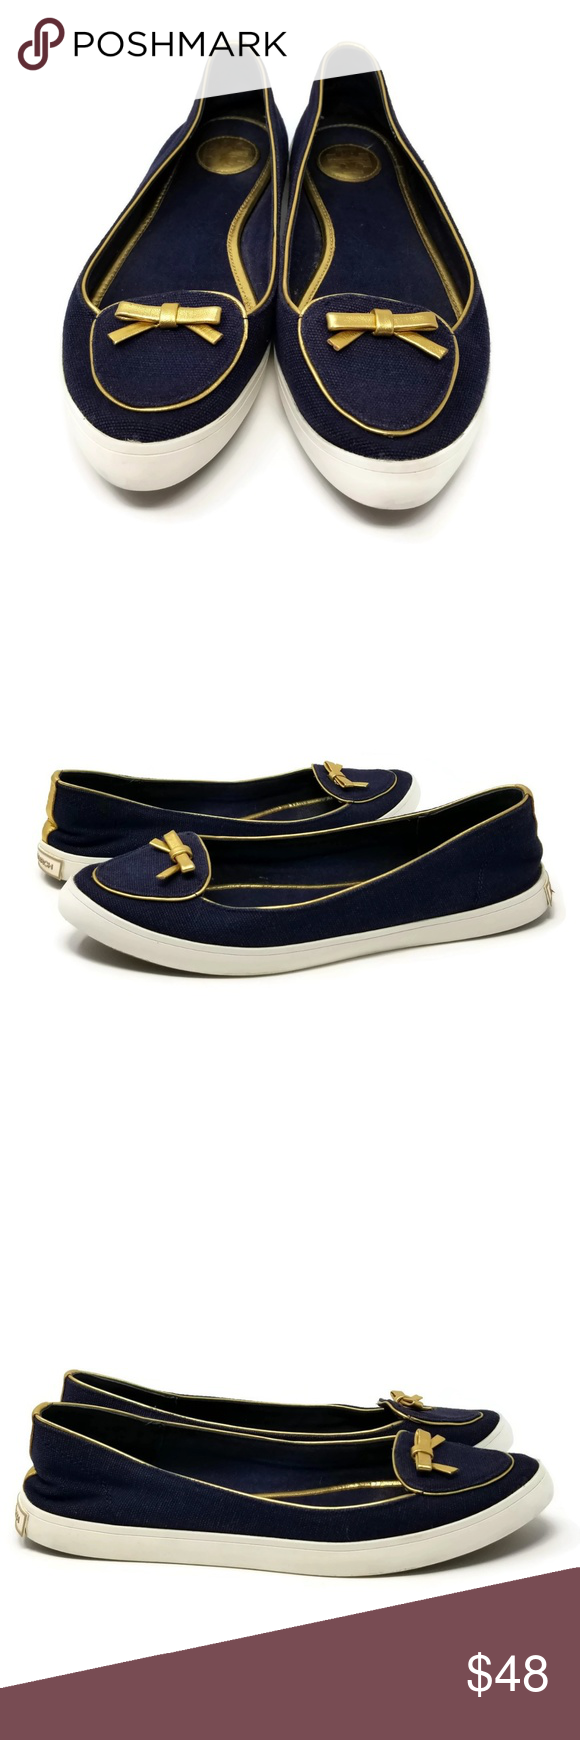 5dc45c83d55f5 Tory Burch Bow Canvas Sneaker Flats Dakota Size 7 Tory Burch Bow Canvas  Sneaker Flats Color